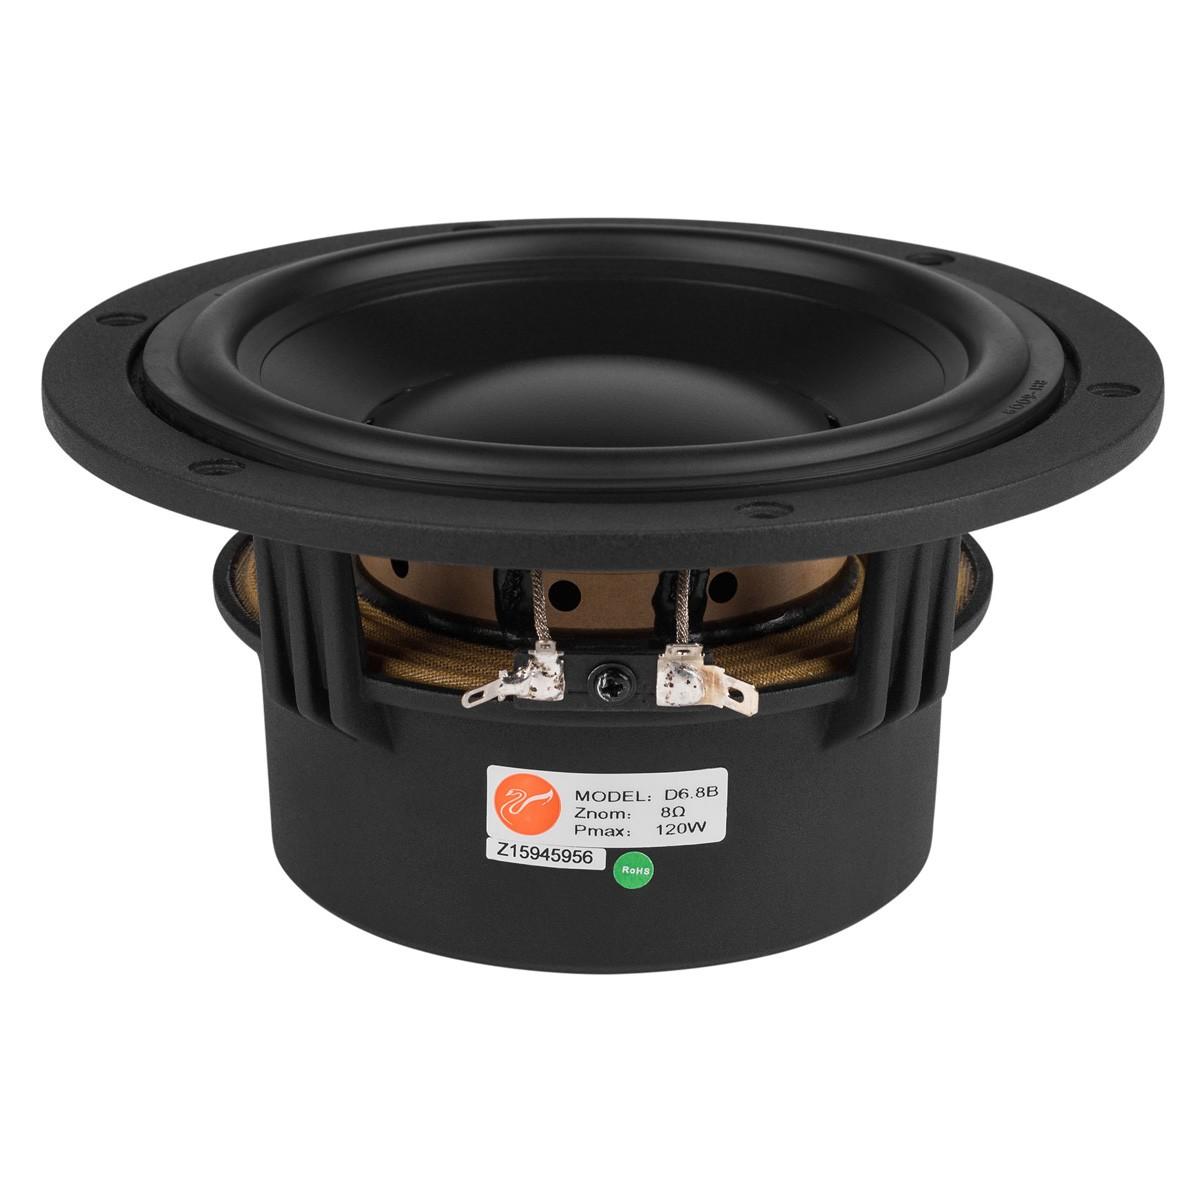 HiVi SWANS D6.8B Speaker Driver Midbass Shielded 60W 8 Ohm 85dB 43Hz - 4000Hz Ø15.2cm